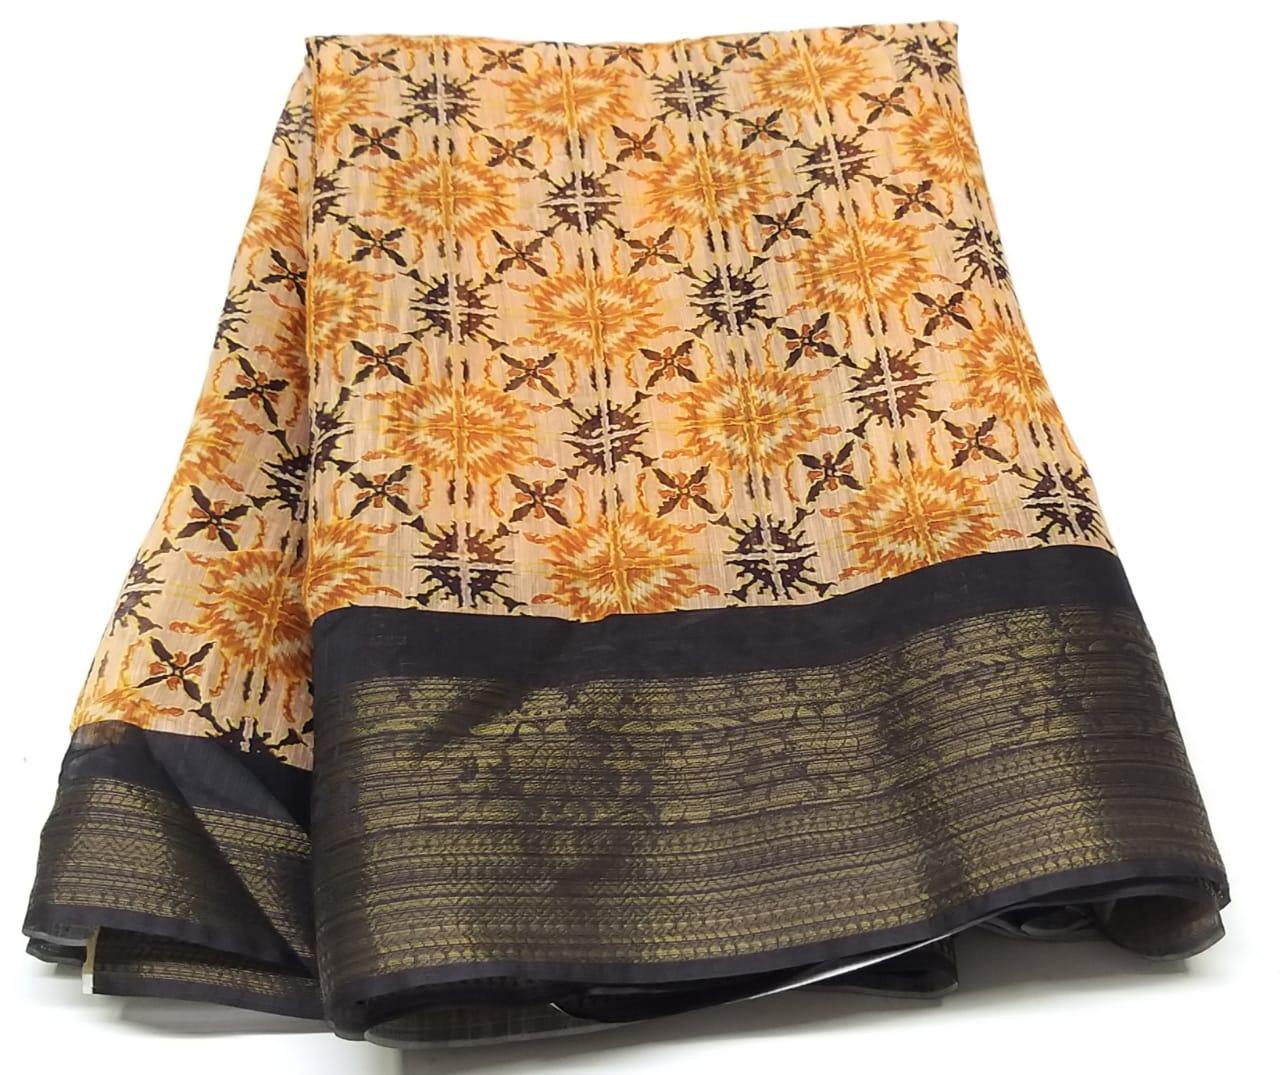 Rambha-1 Light Yellow Cotton Saree